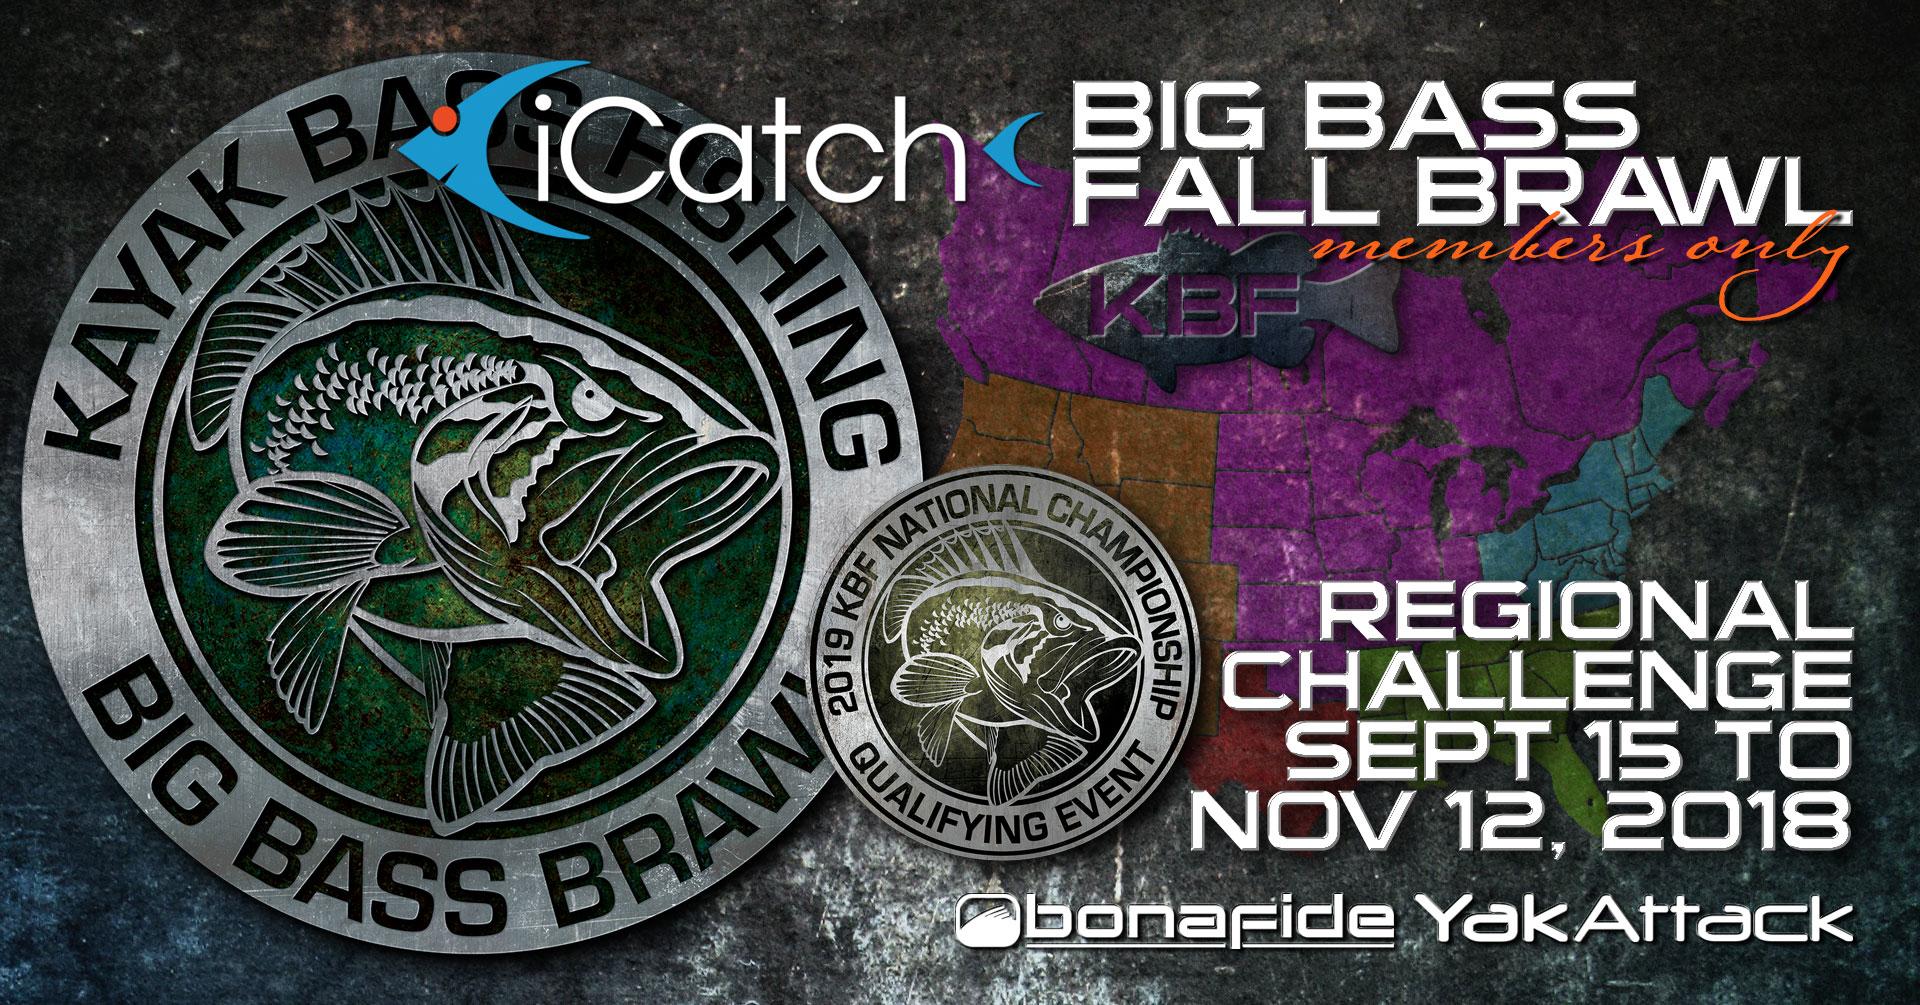 c8d67399c03 iCatch KBF Big Bass Fall Brawl